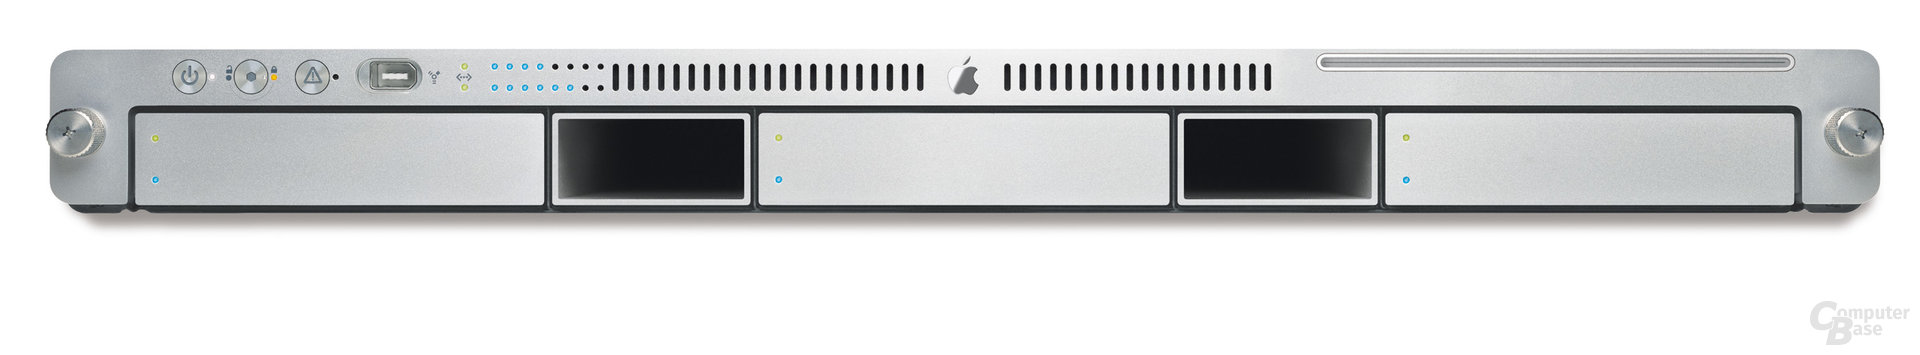 Apple Xserve mit 2x Dual-Core Xeon 5100